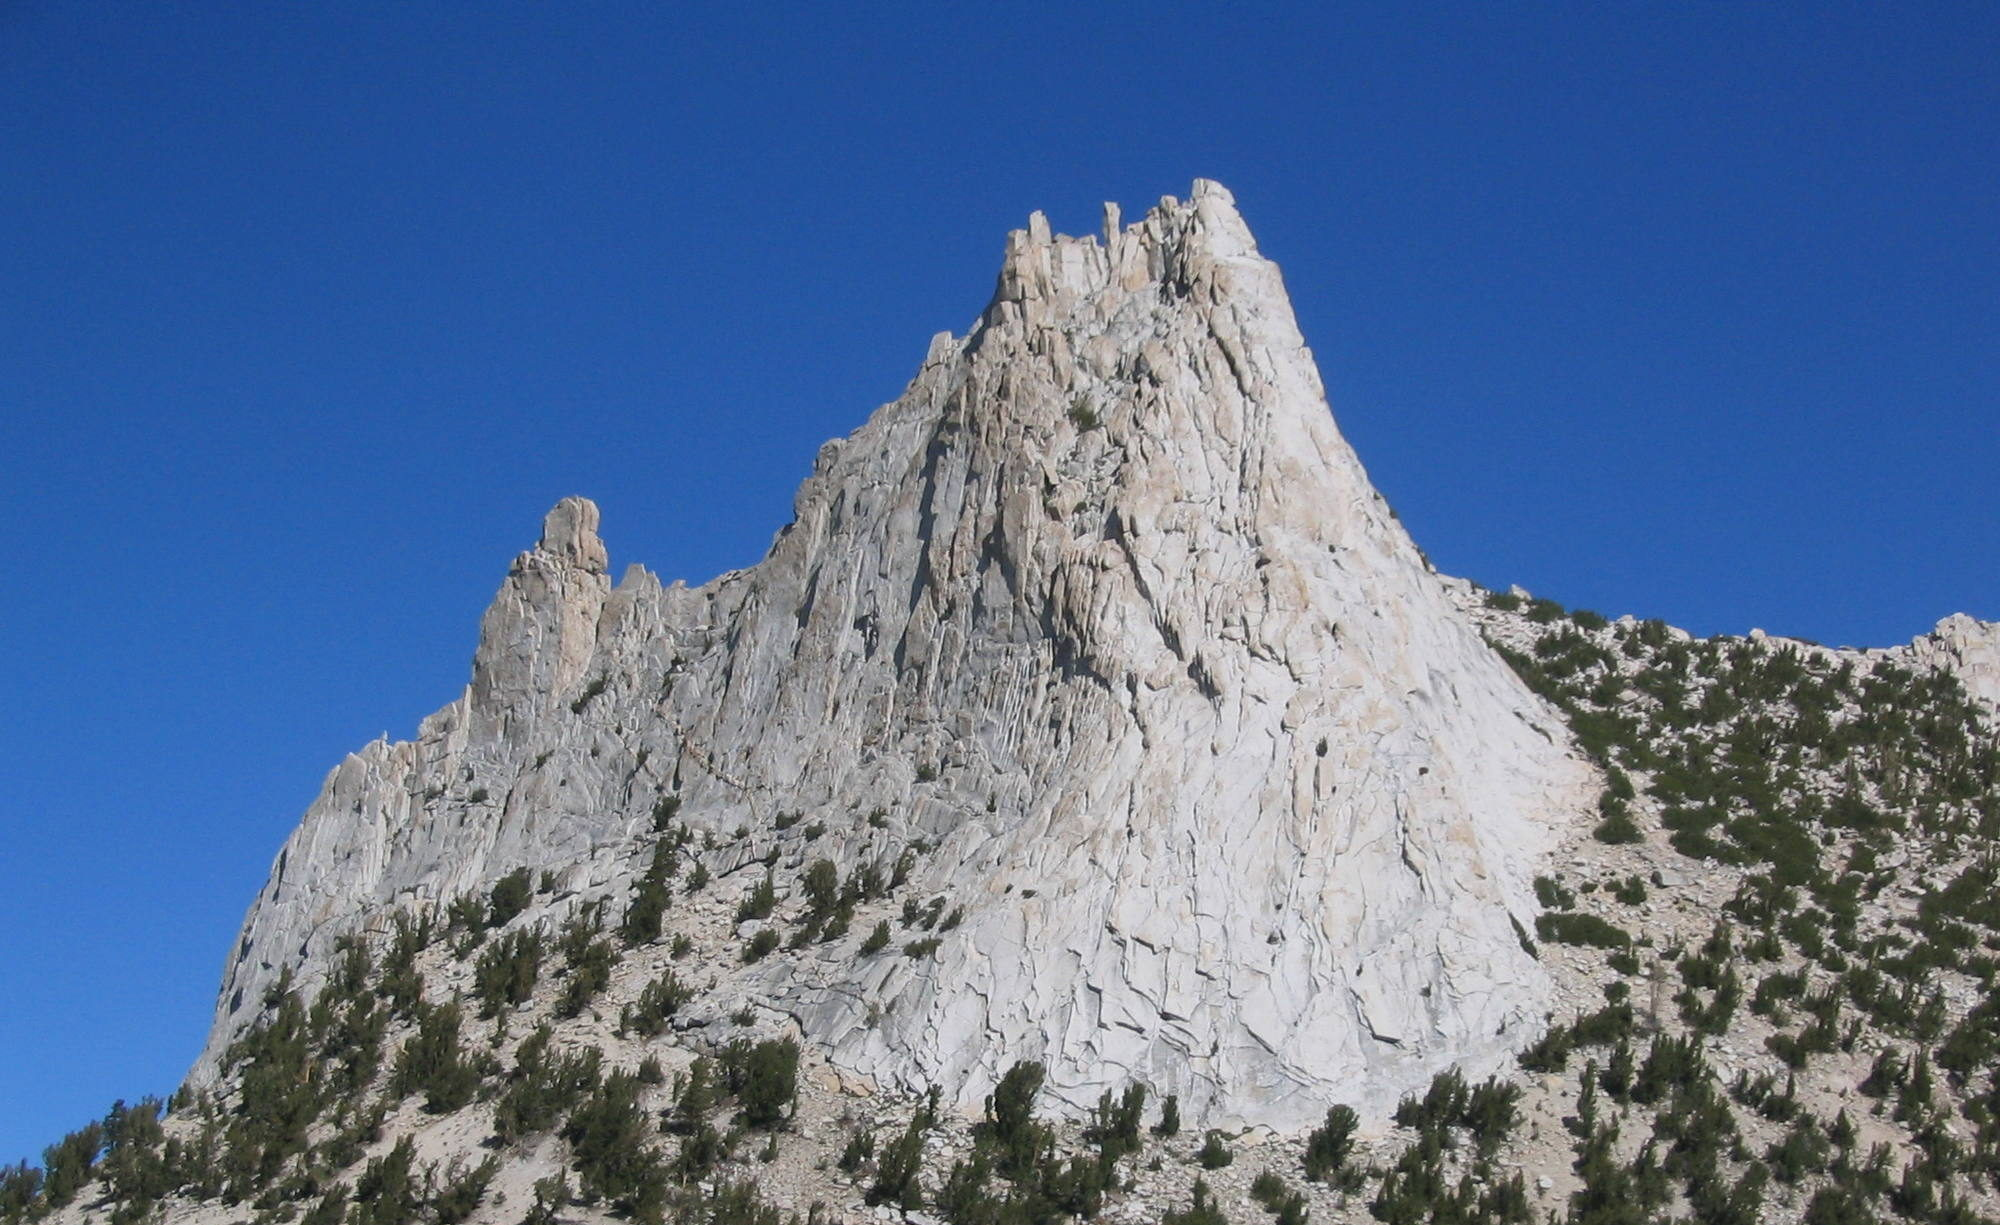 Accident Report: Rockfall, Cathedral Peak - Yosemite